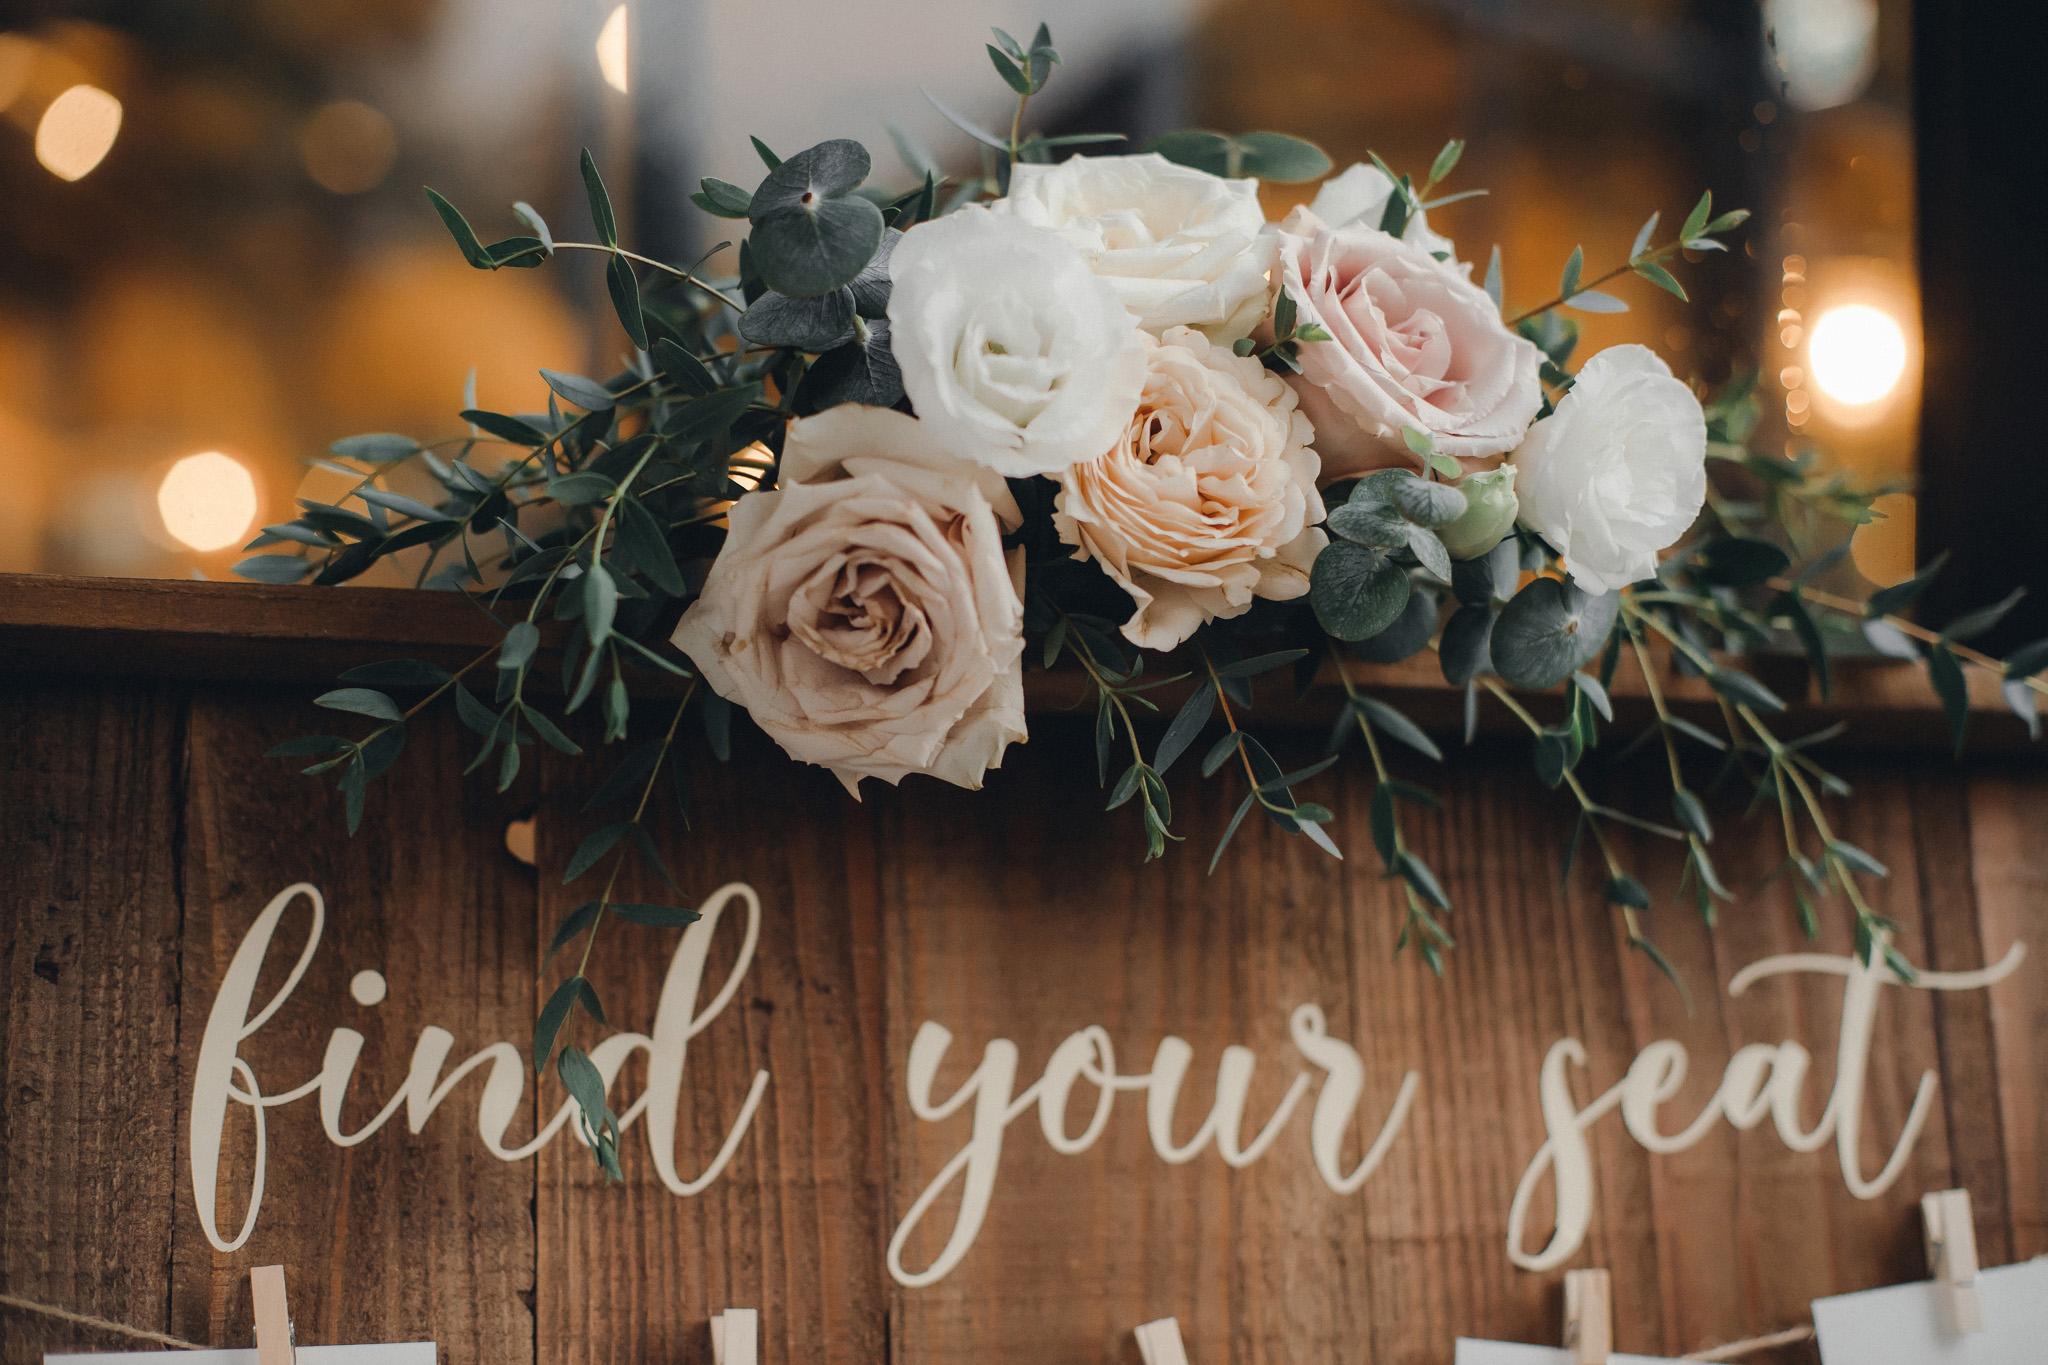 EW 台北婚攝 居米 濟南教會 Brick Yard 33 美軍俱樂部 婚禮 婚宴-60